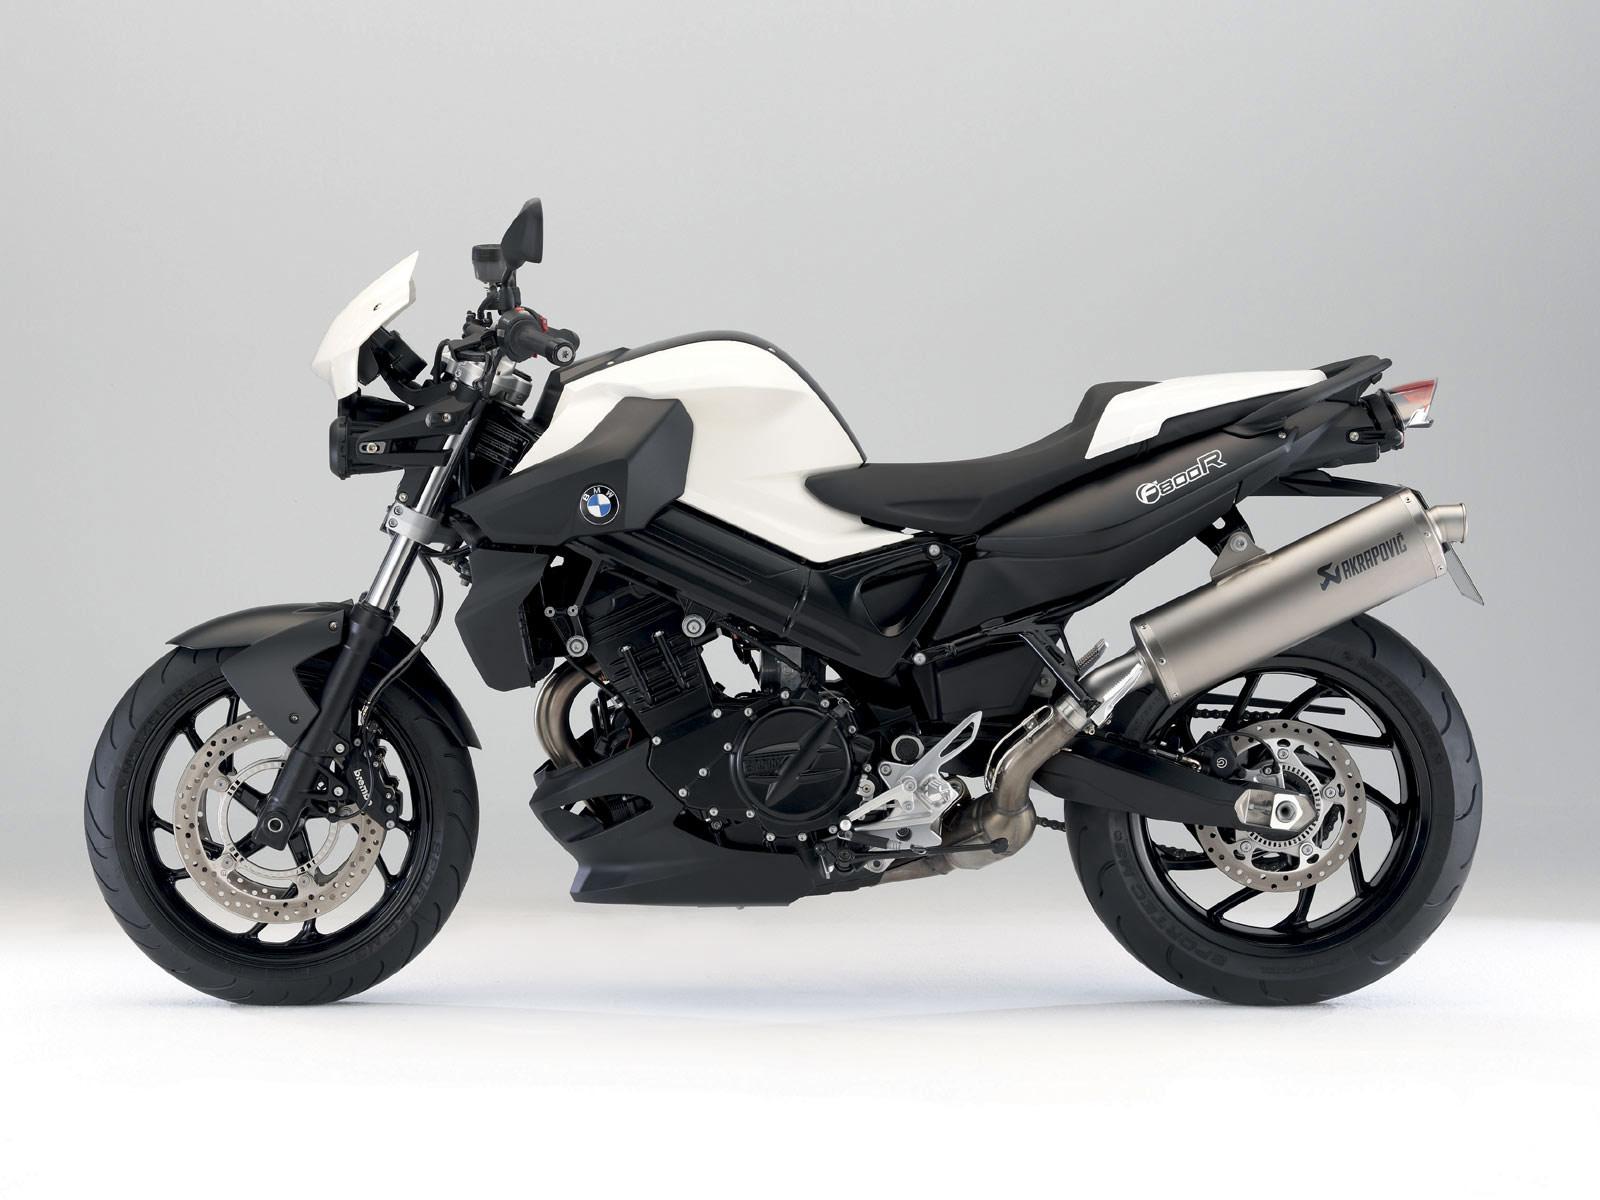 2008 BMW F800R motorcycle desktop wallpaper 1600x1200